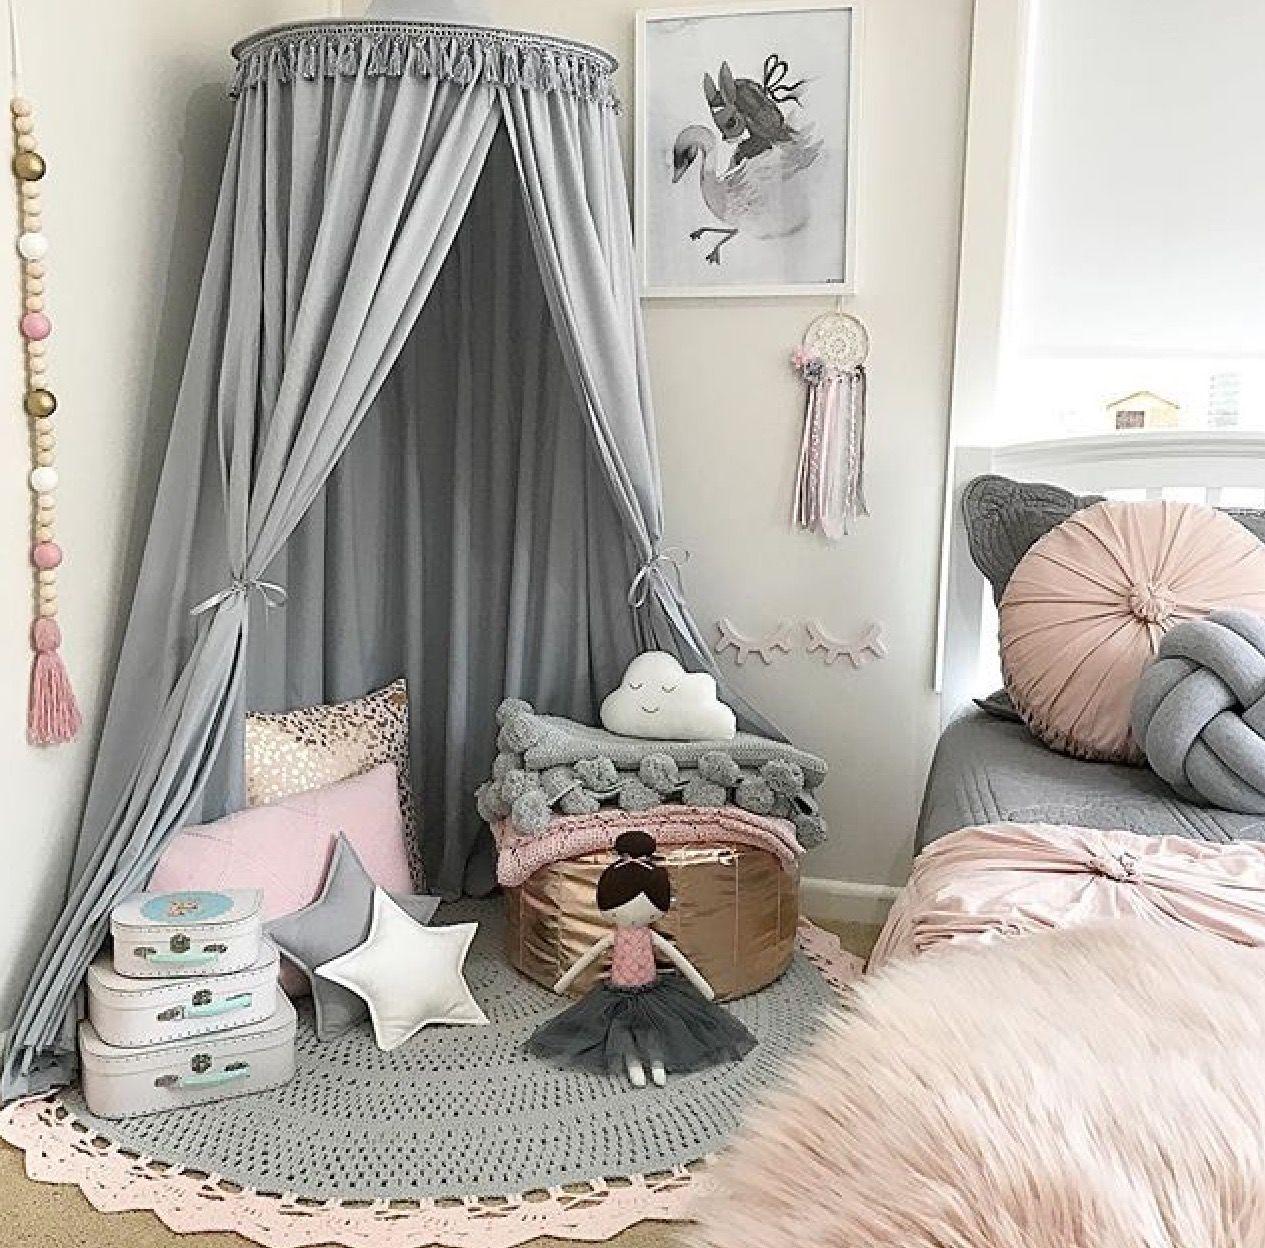 Handmade Crochet Rugs u0026 Beautiful Childrenu0027s Decor including canopies for Kids Rooms u0026 Baby ... & Handmade Crochet Rugs u0026 Beautiful Childrenu0027s Decor including ...